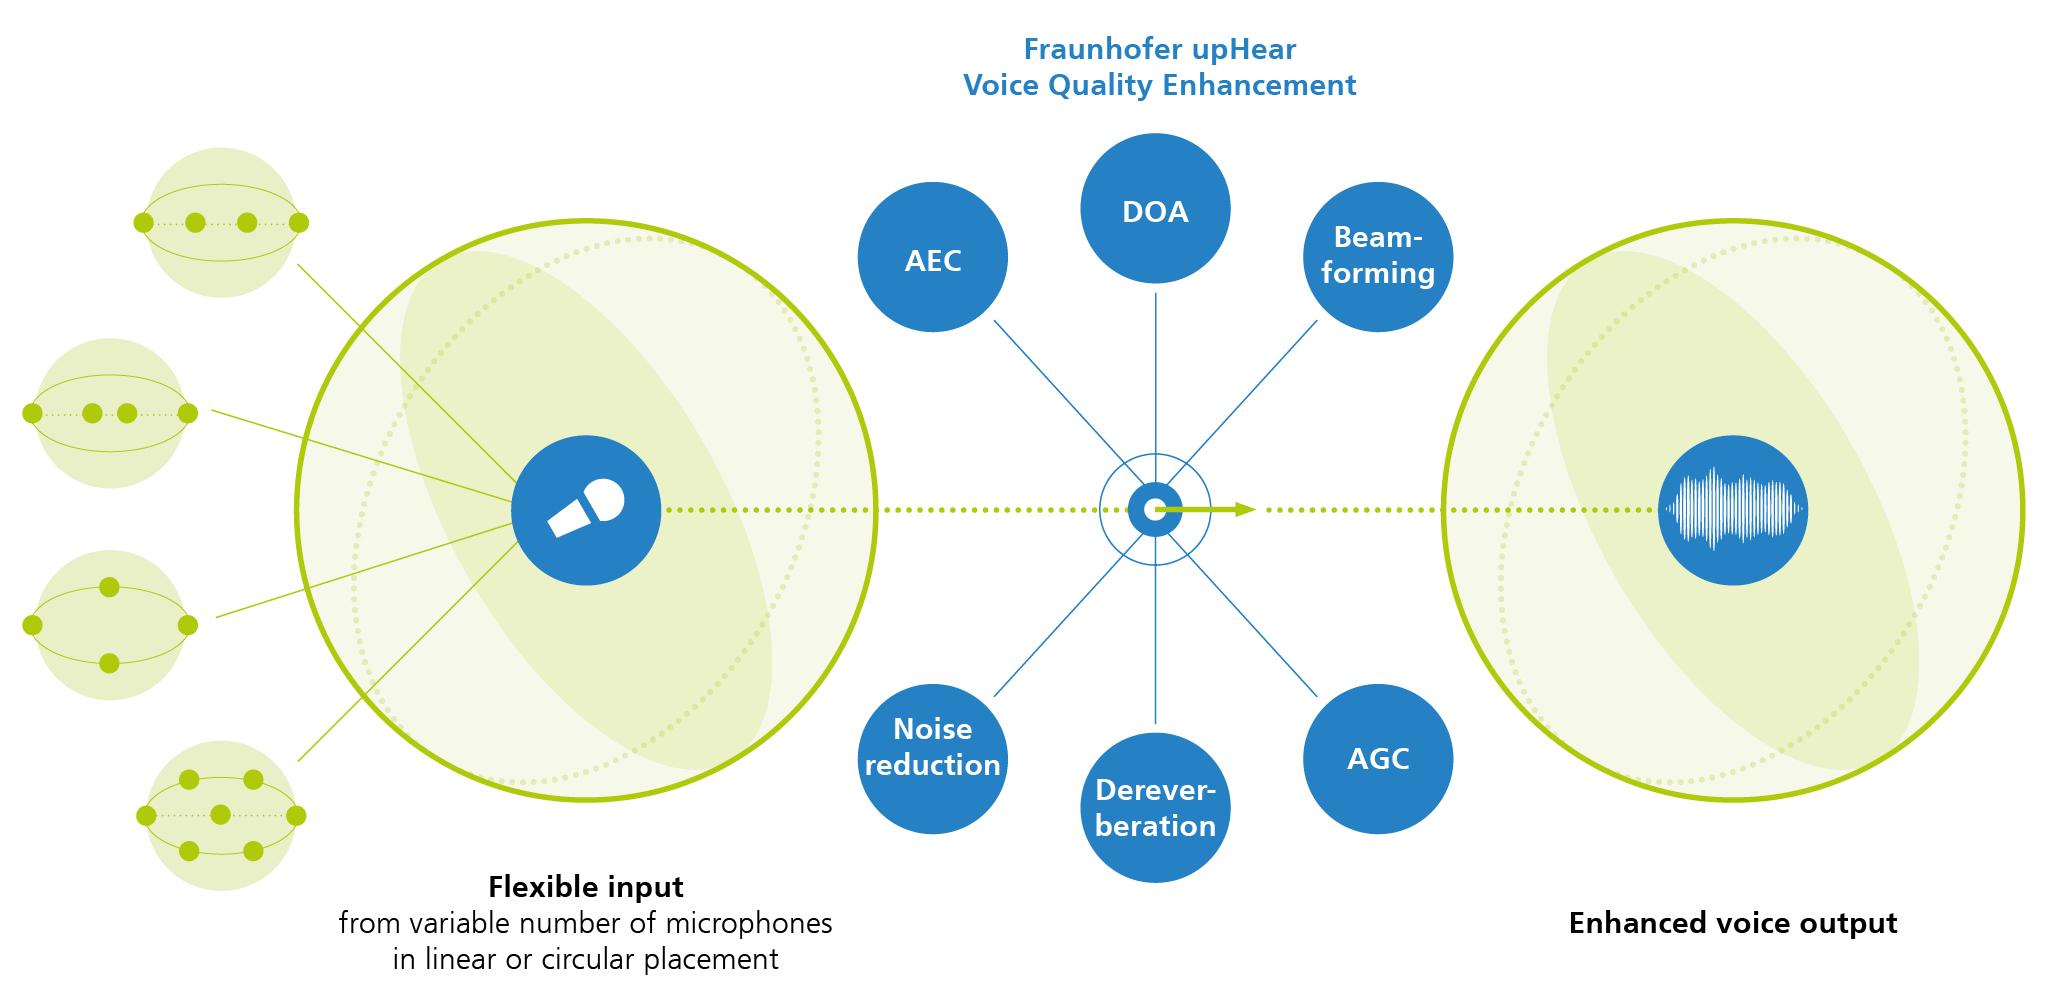 Fraunhofer upHear Voice Quality Enhancement